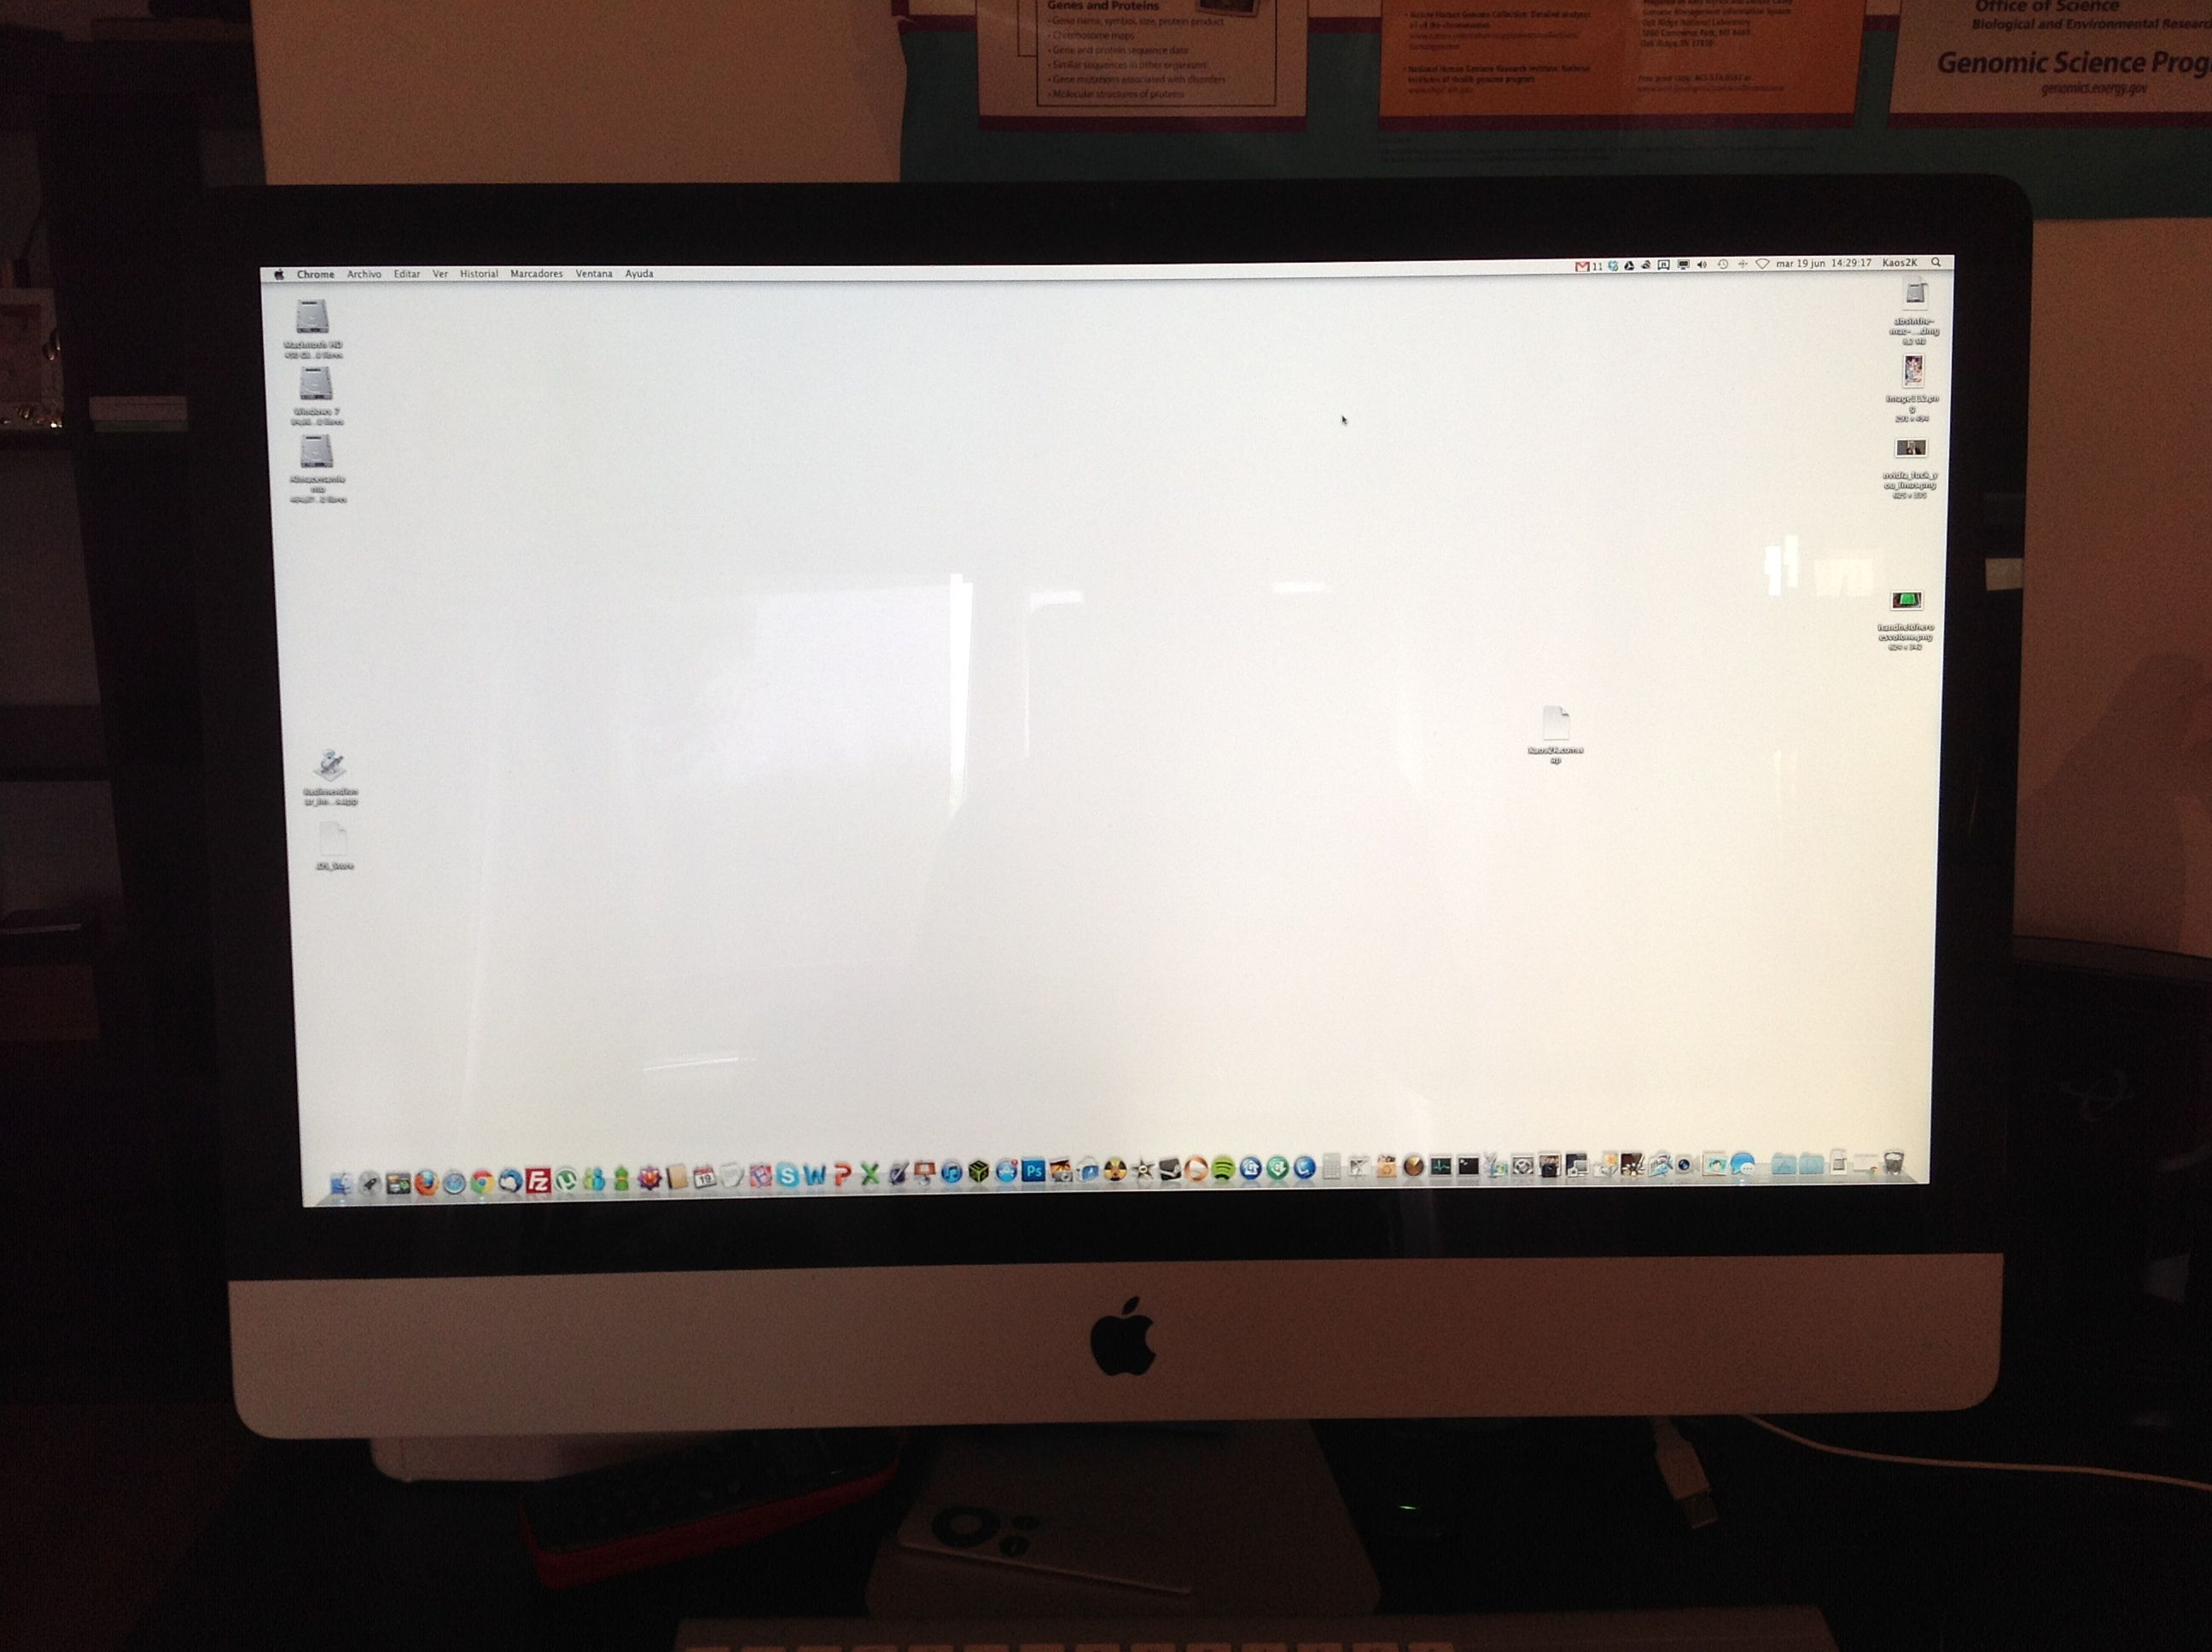 GUIDE] Fix iMac flickering and dark scre… - Apple Community